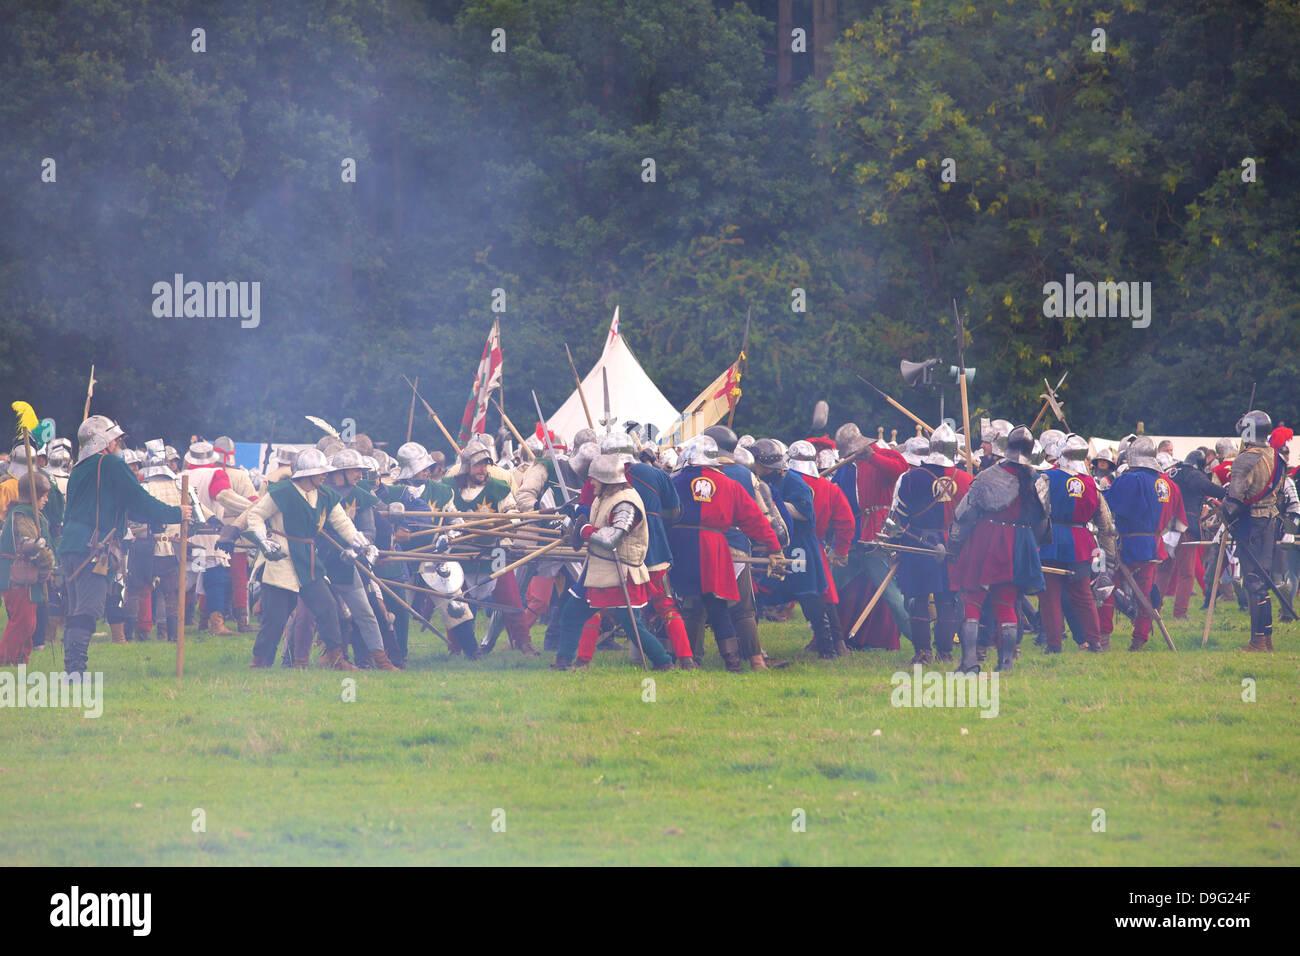 Battle of Bosworth Field Re-enactment, Market Bosworth, Leicestershire, England, UK - Stock Image